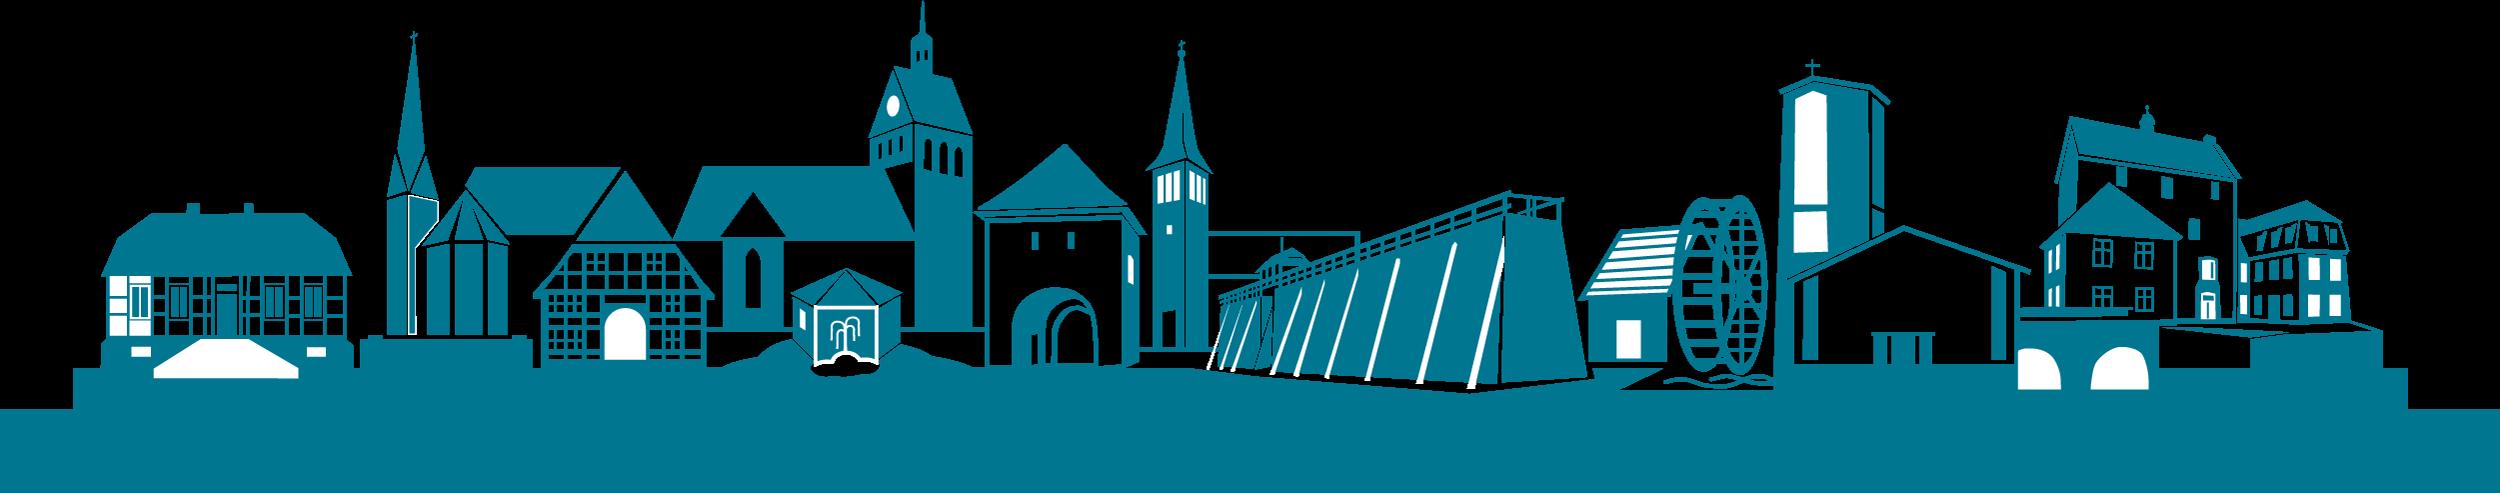 StadtSilouette Salzkotten